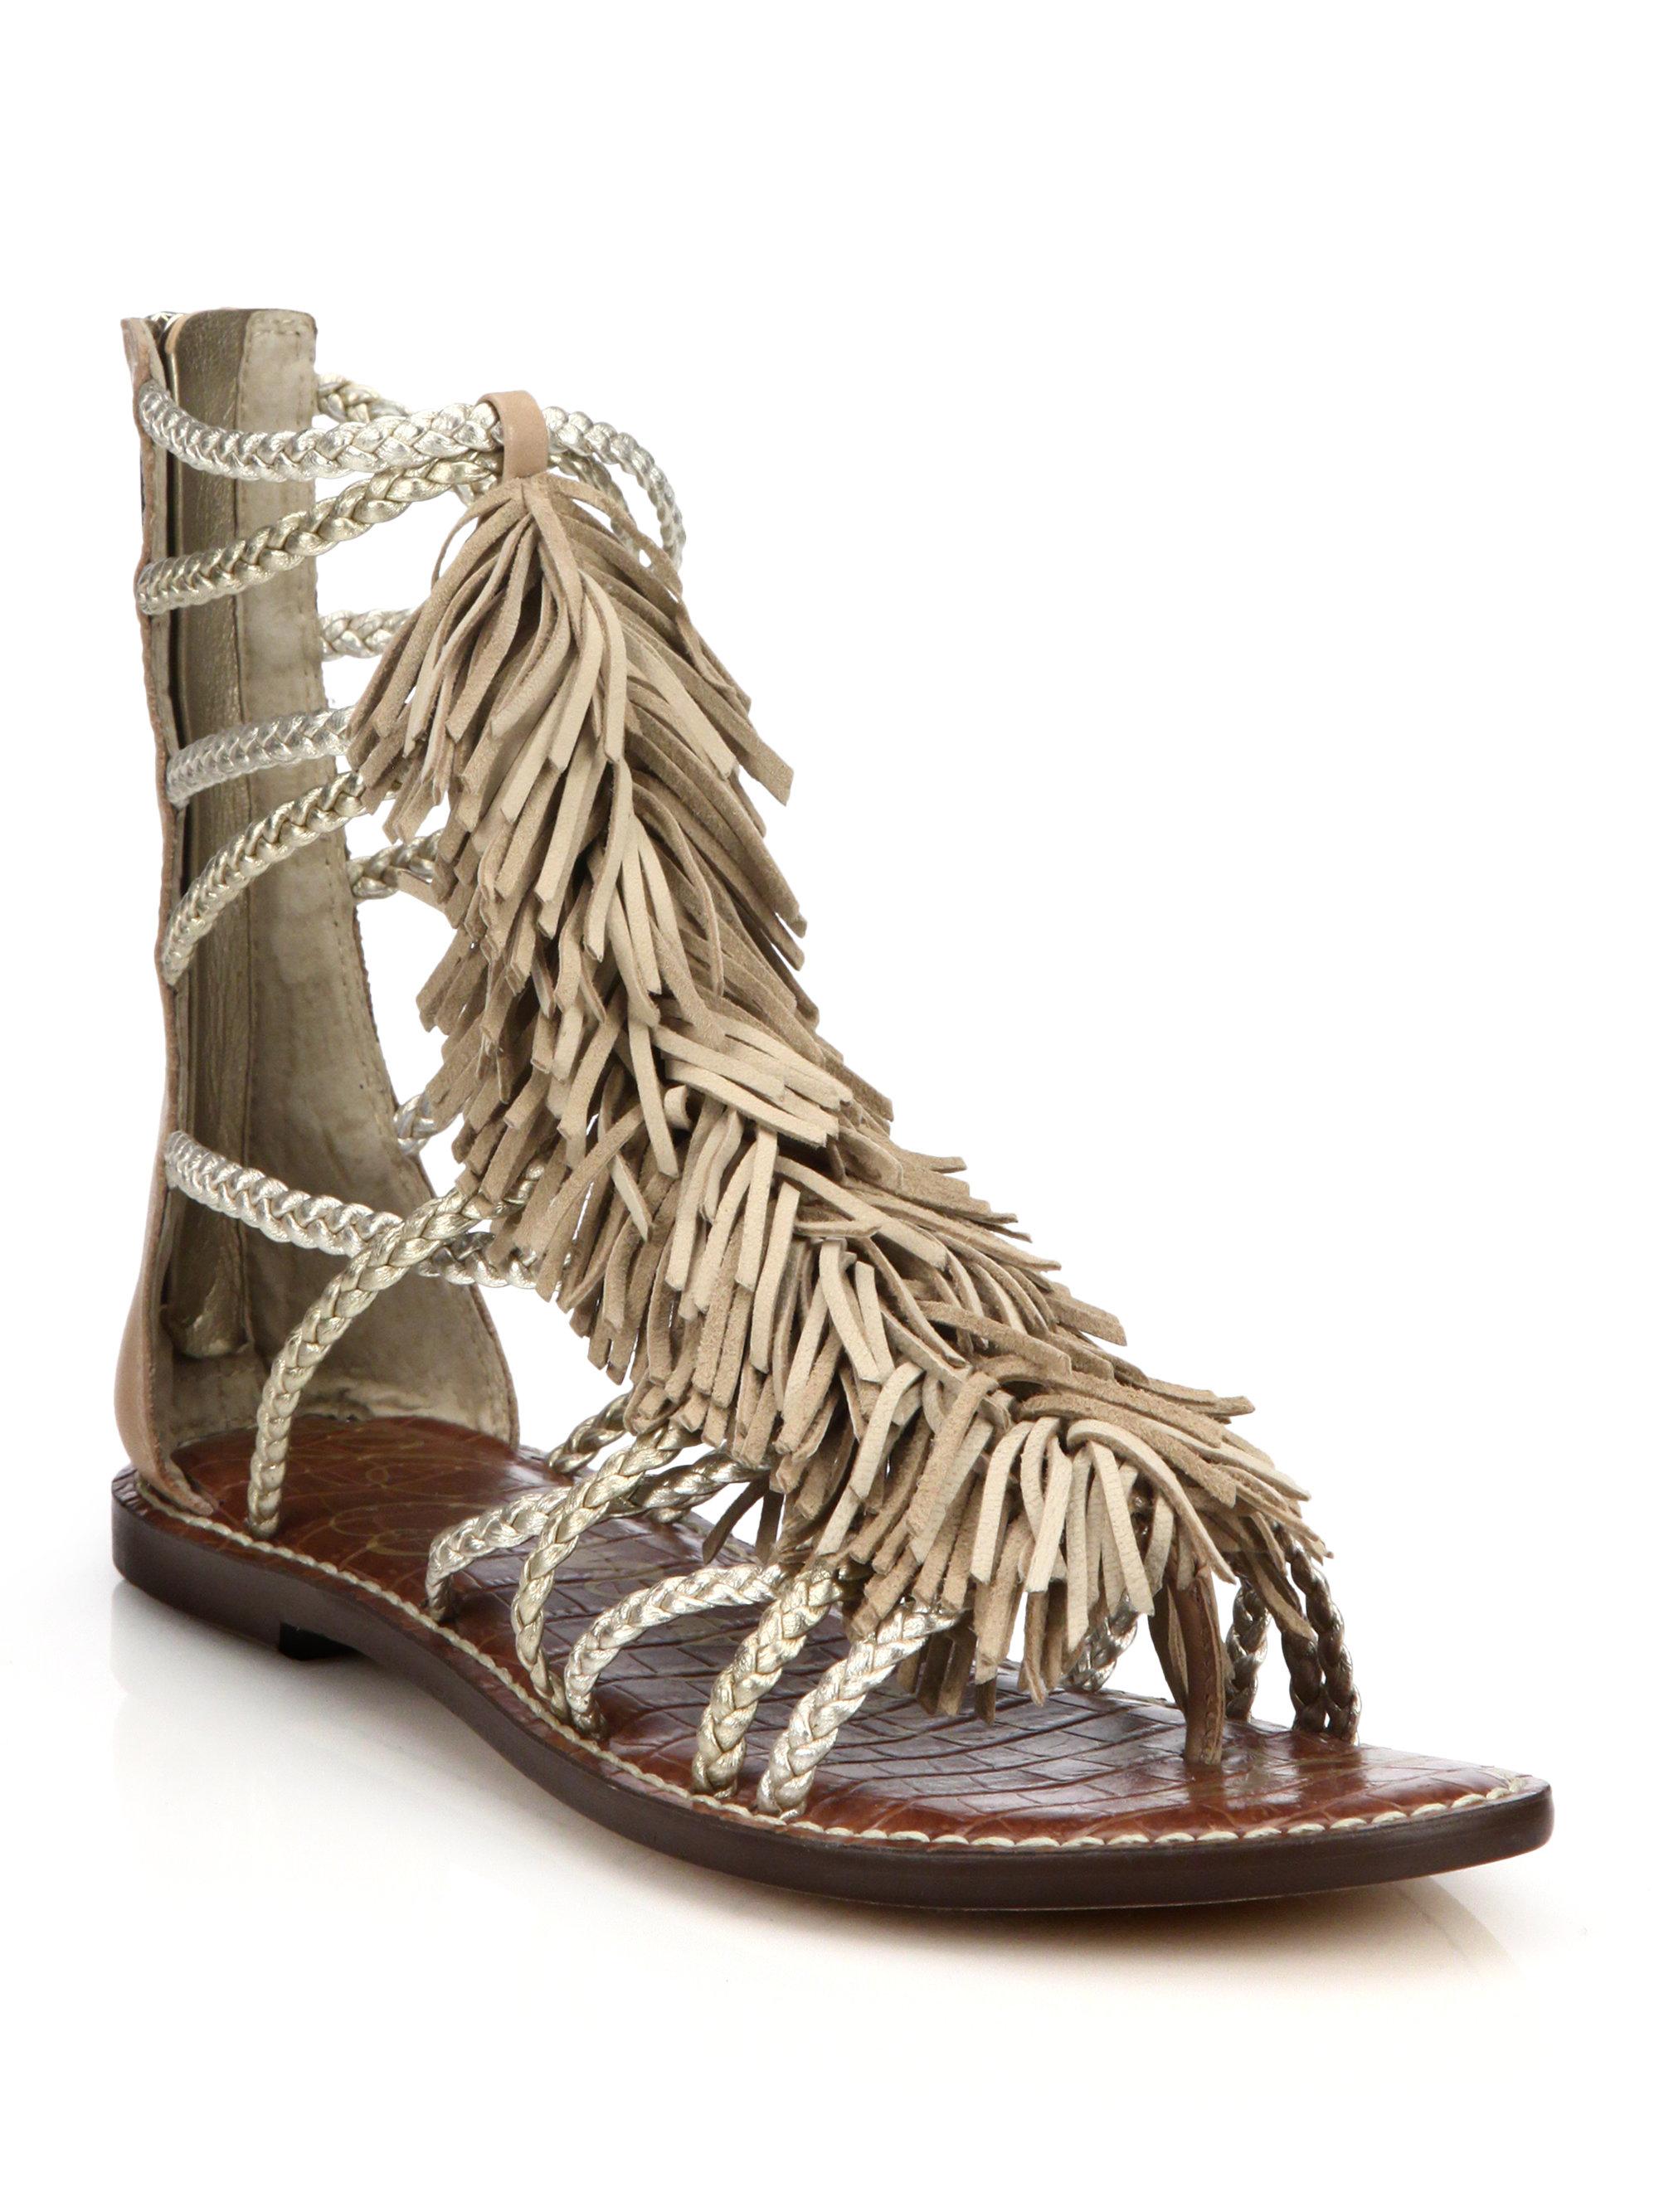 5adac9b39 Lyst - Sam Edelman Gisela Fringed Metallic Leather Gladiator Sandals ...